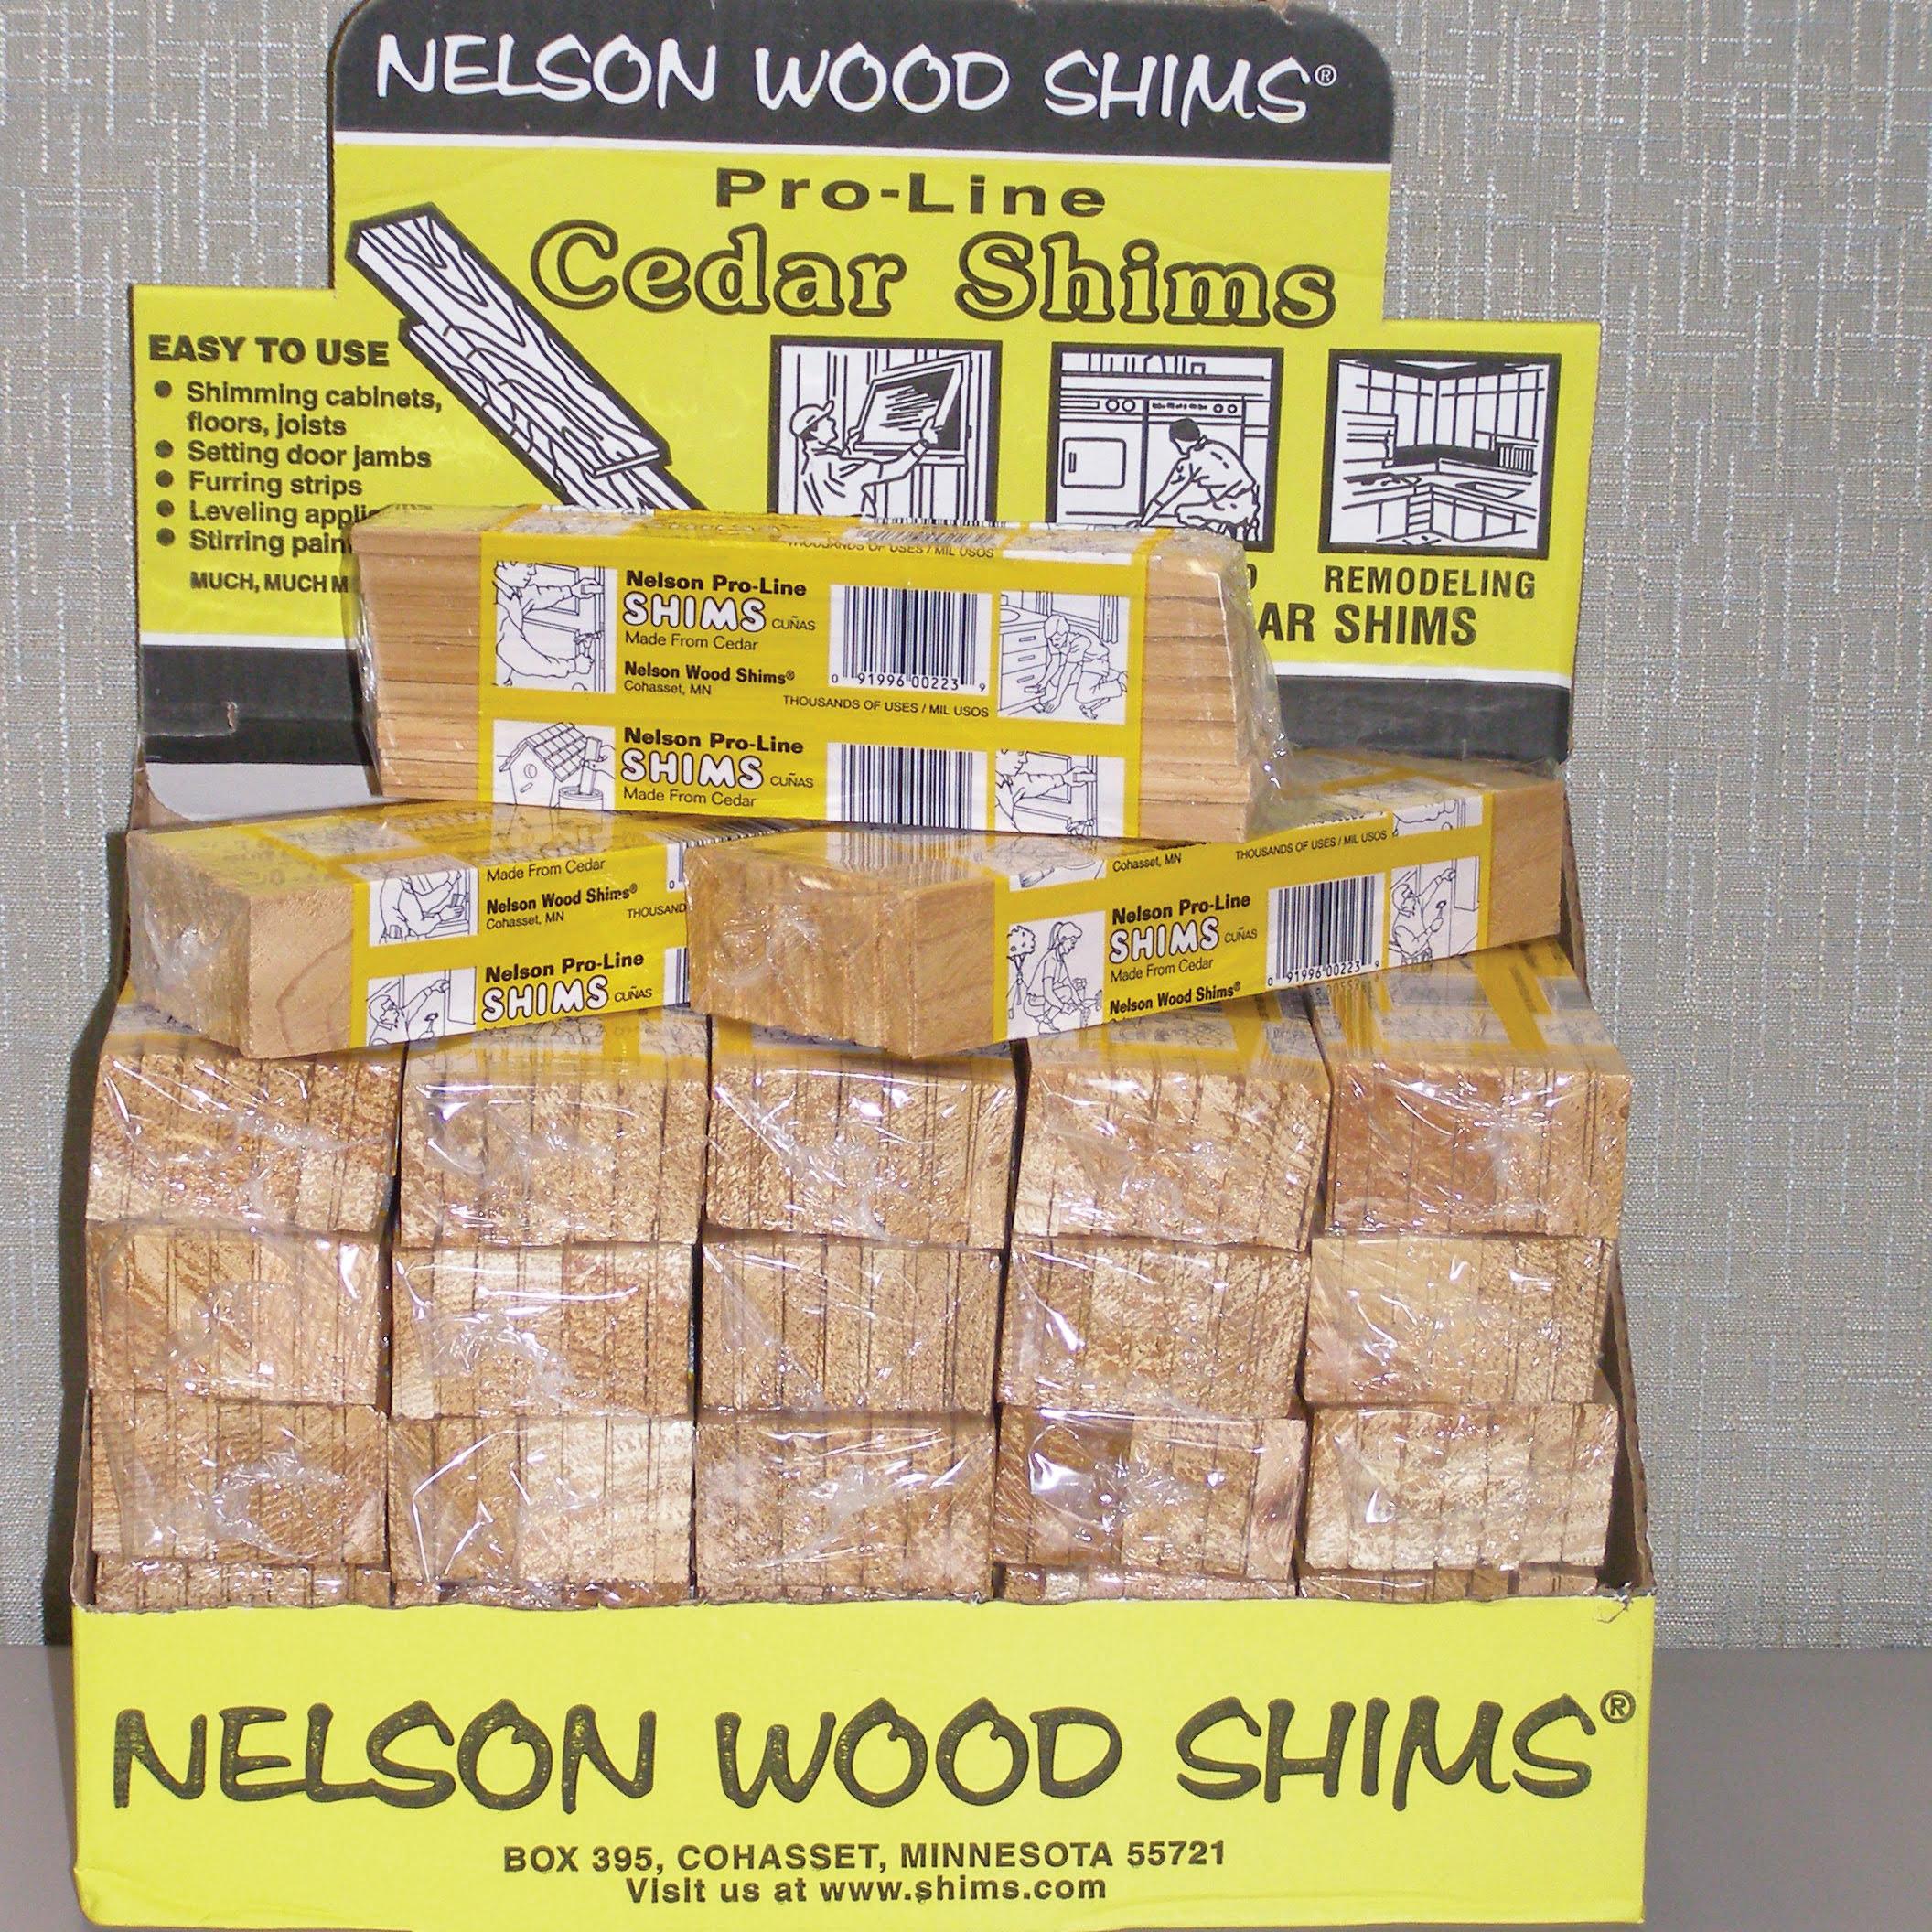 Nelson Wood Shims